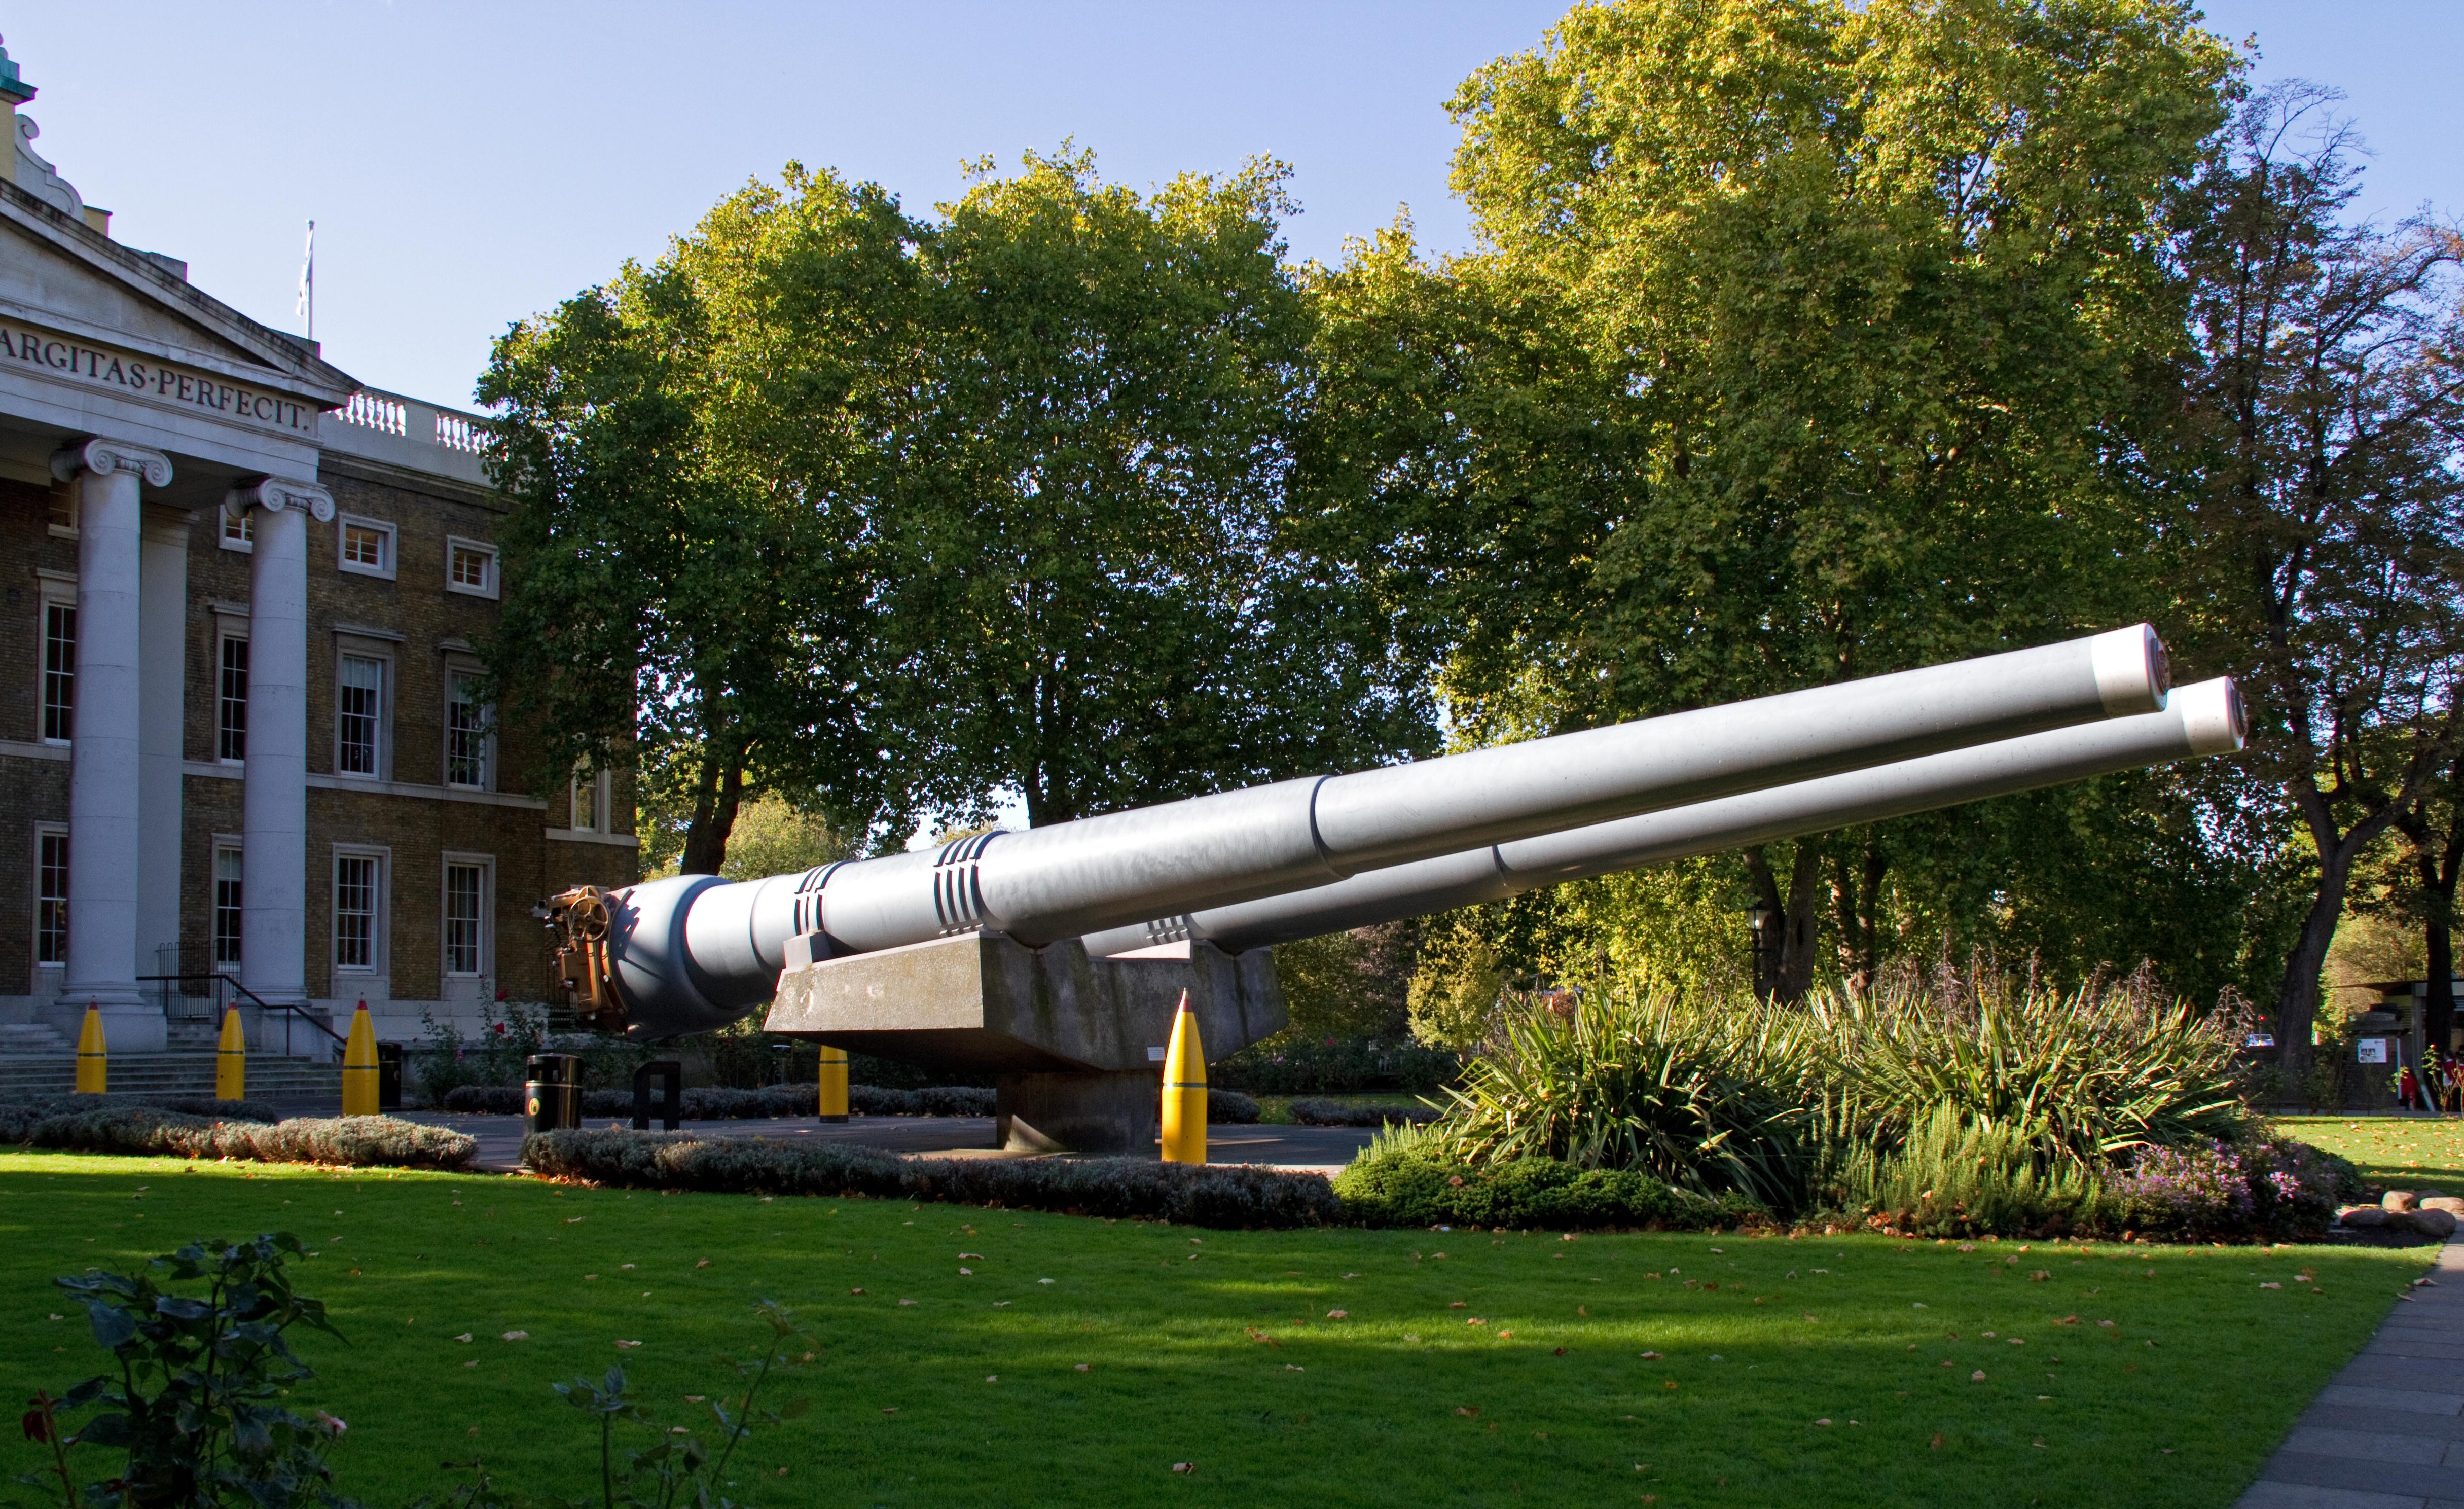 File:15inch Naval Guns (6264175943).jpg - Wikimedia Commons